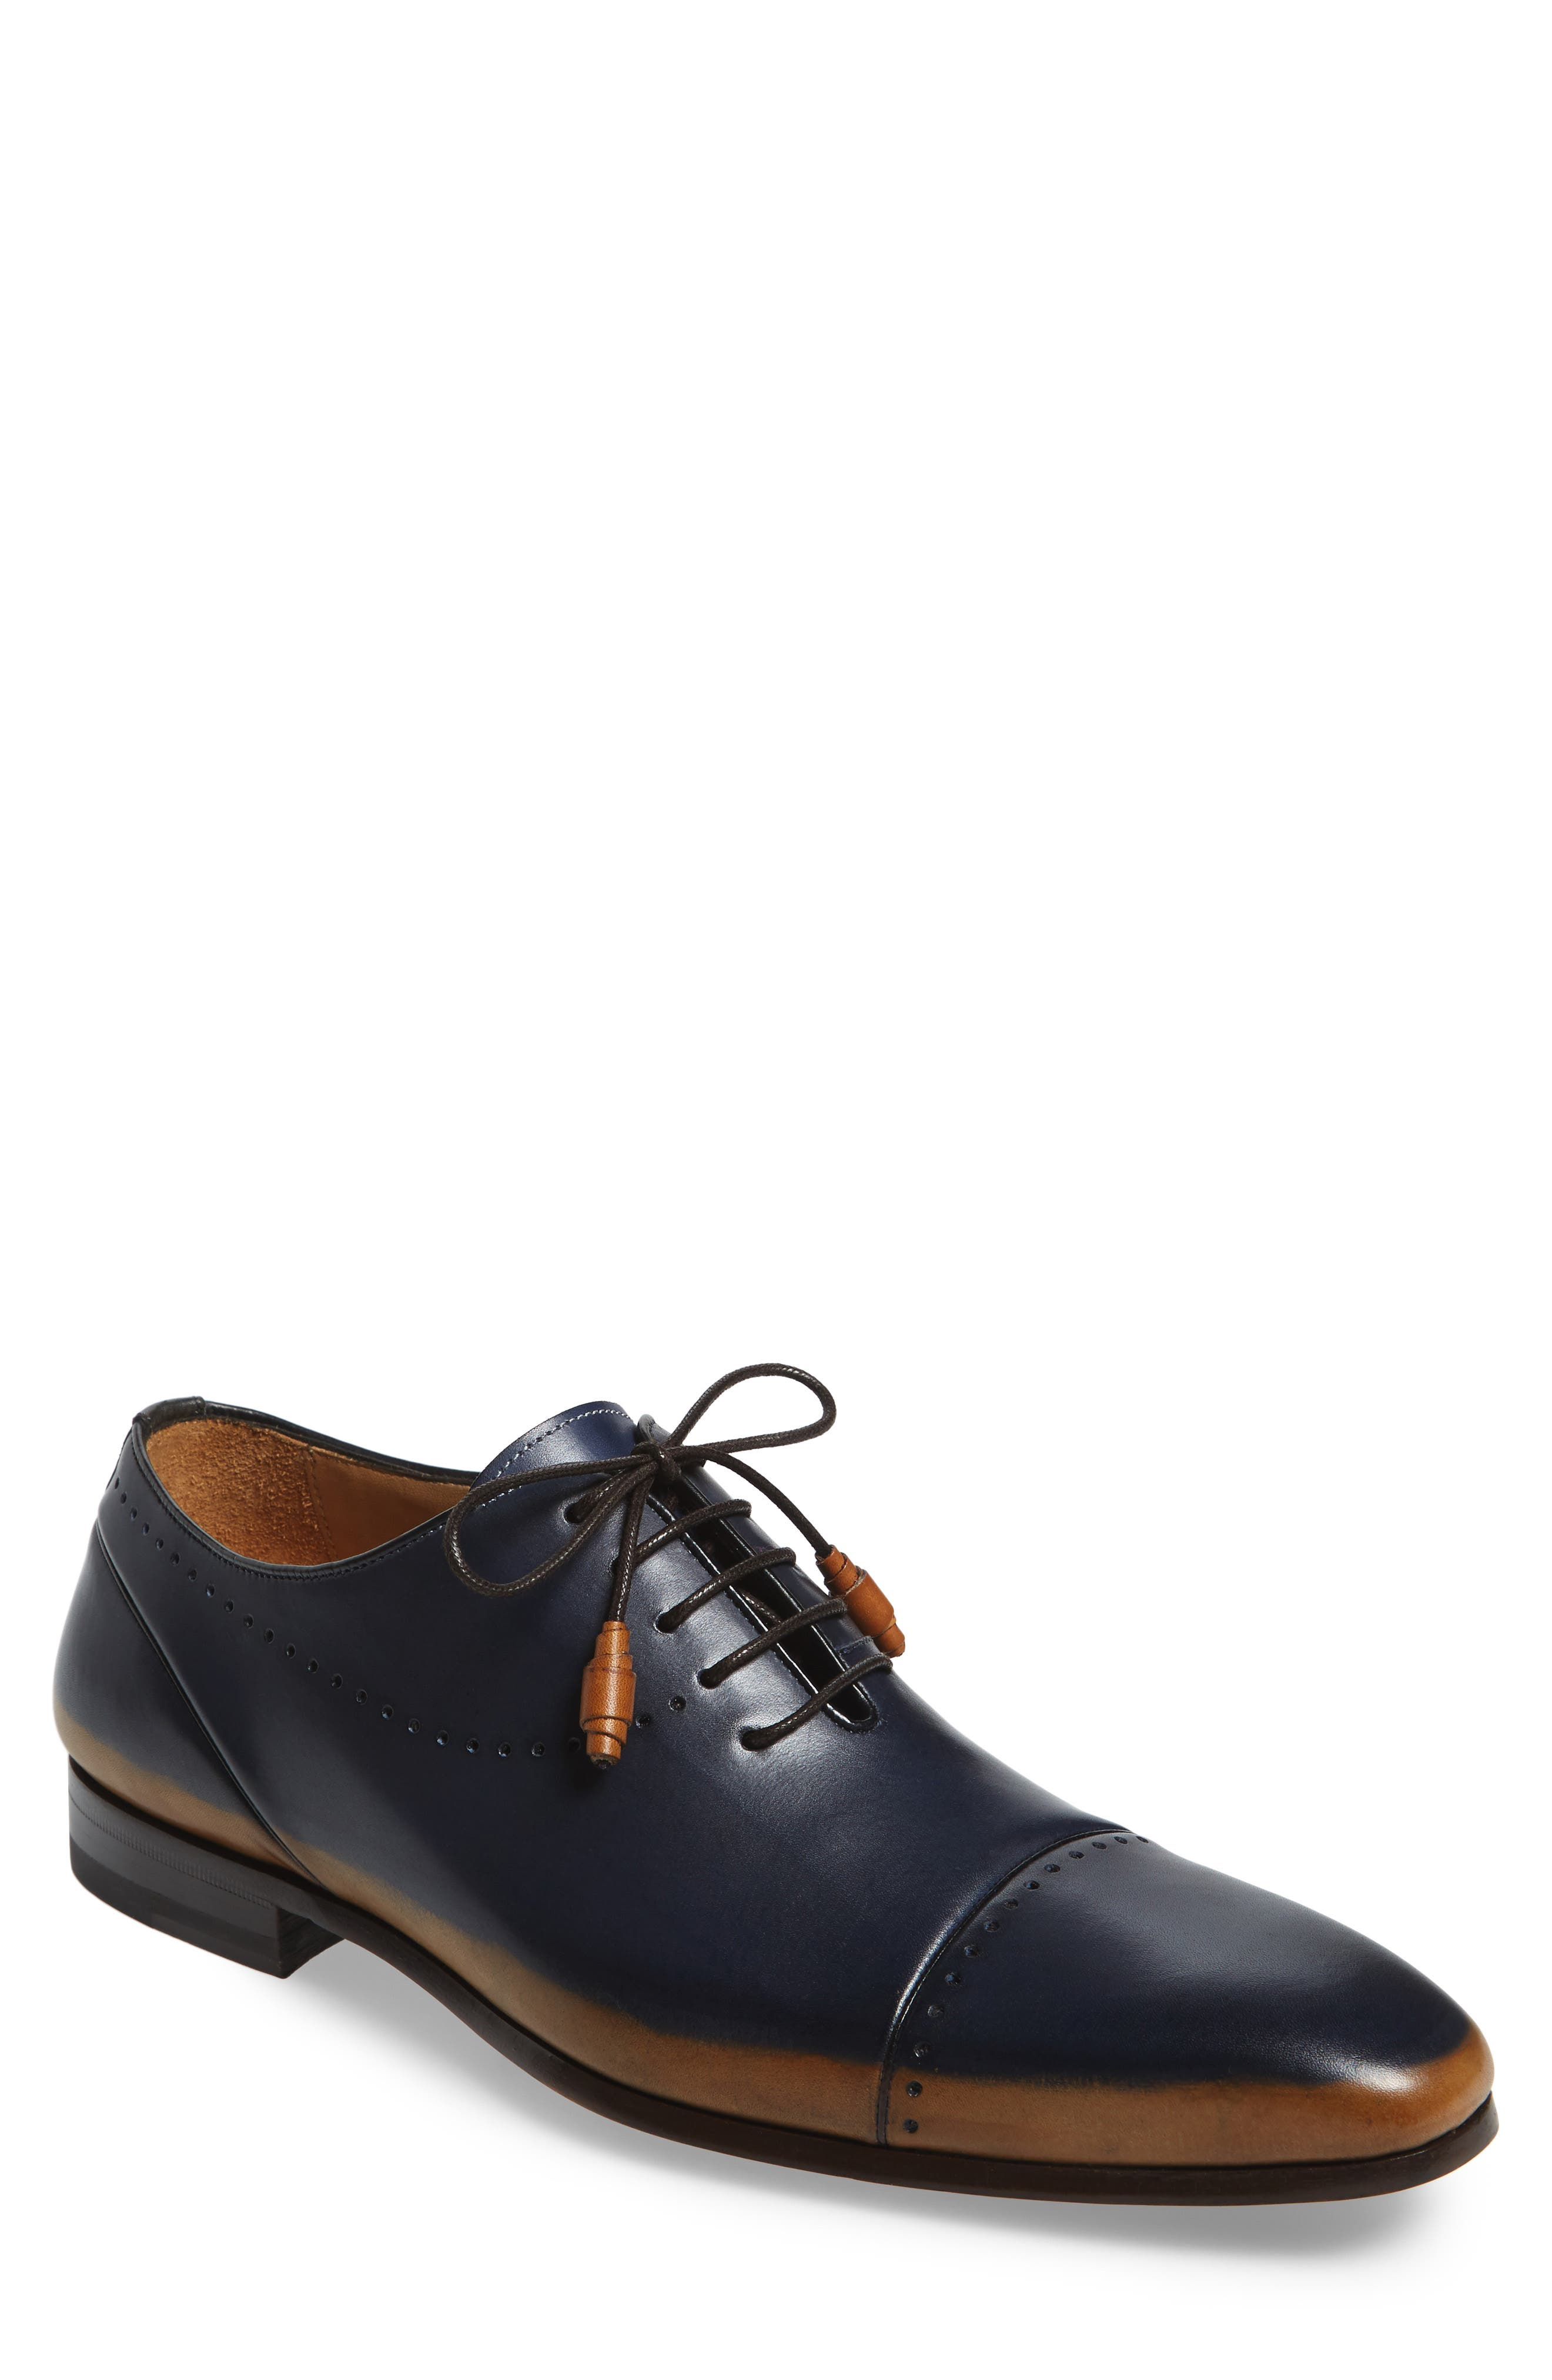 Icaro Cap Toe Oxford,                             Main thumbnail 1, color,                             Tan/ Blue Leather